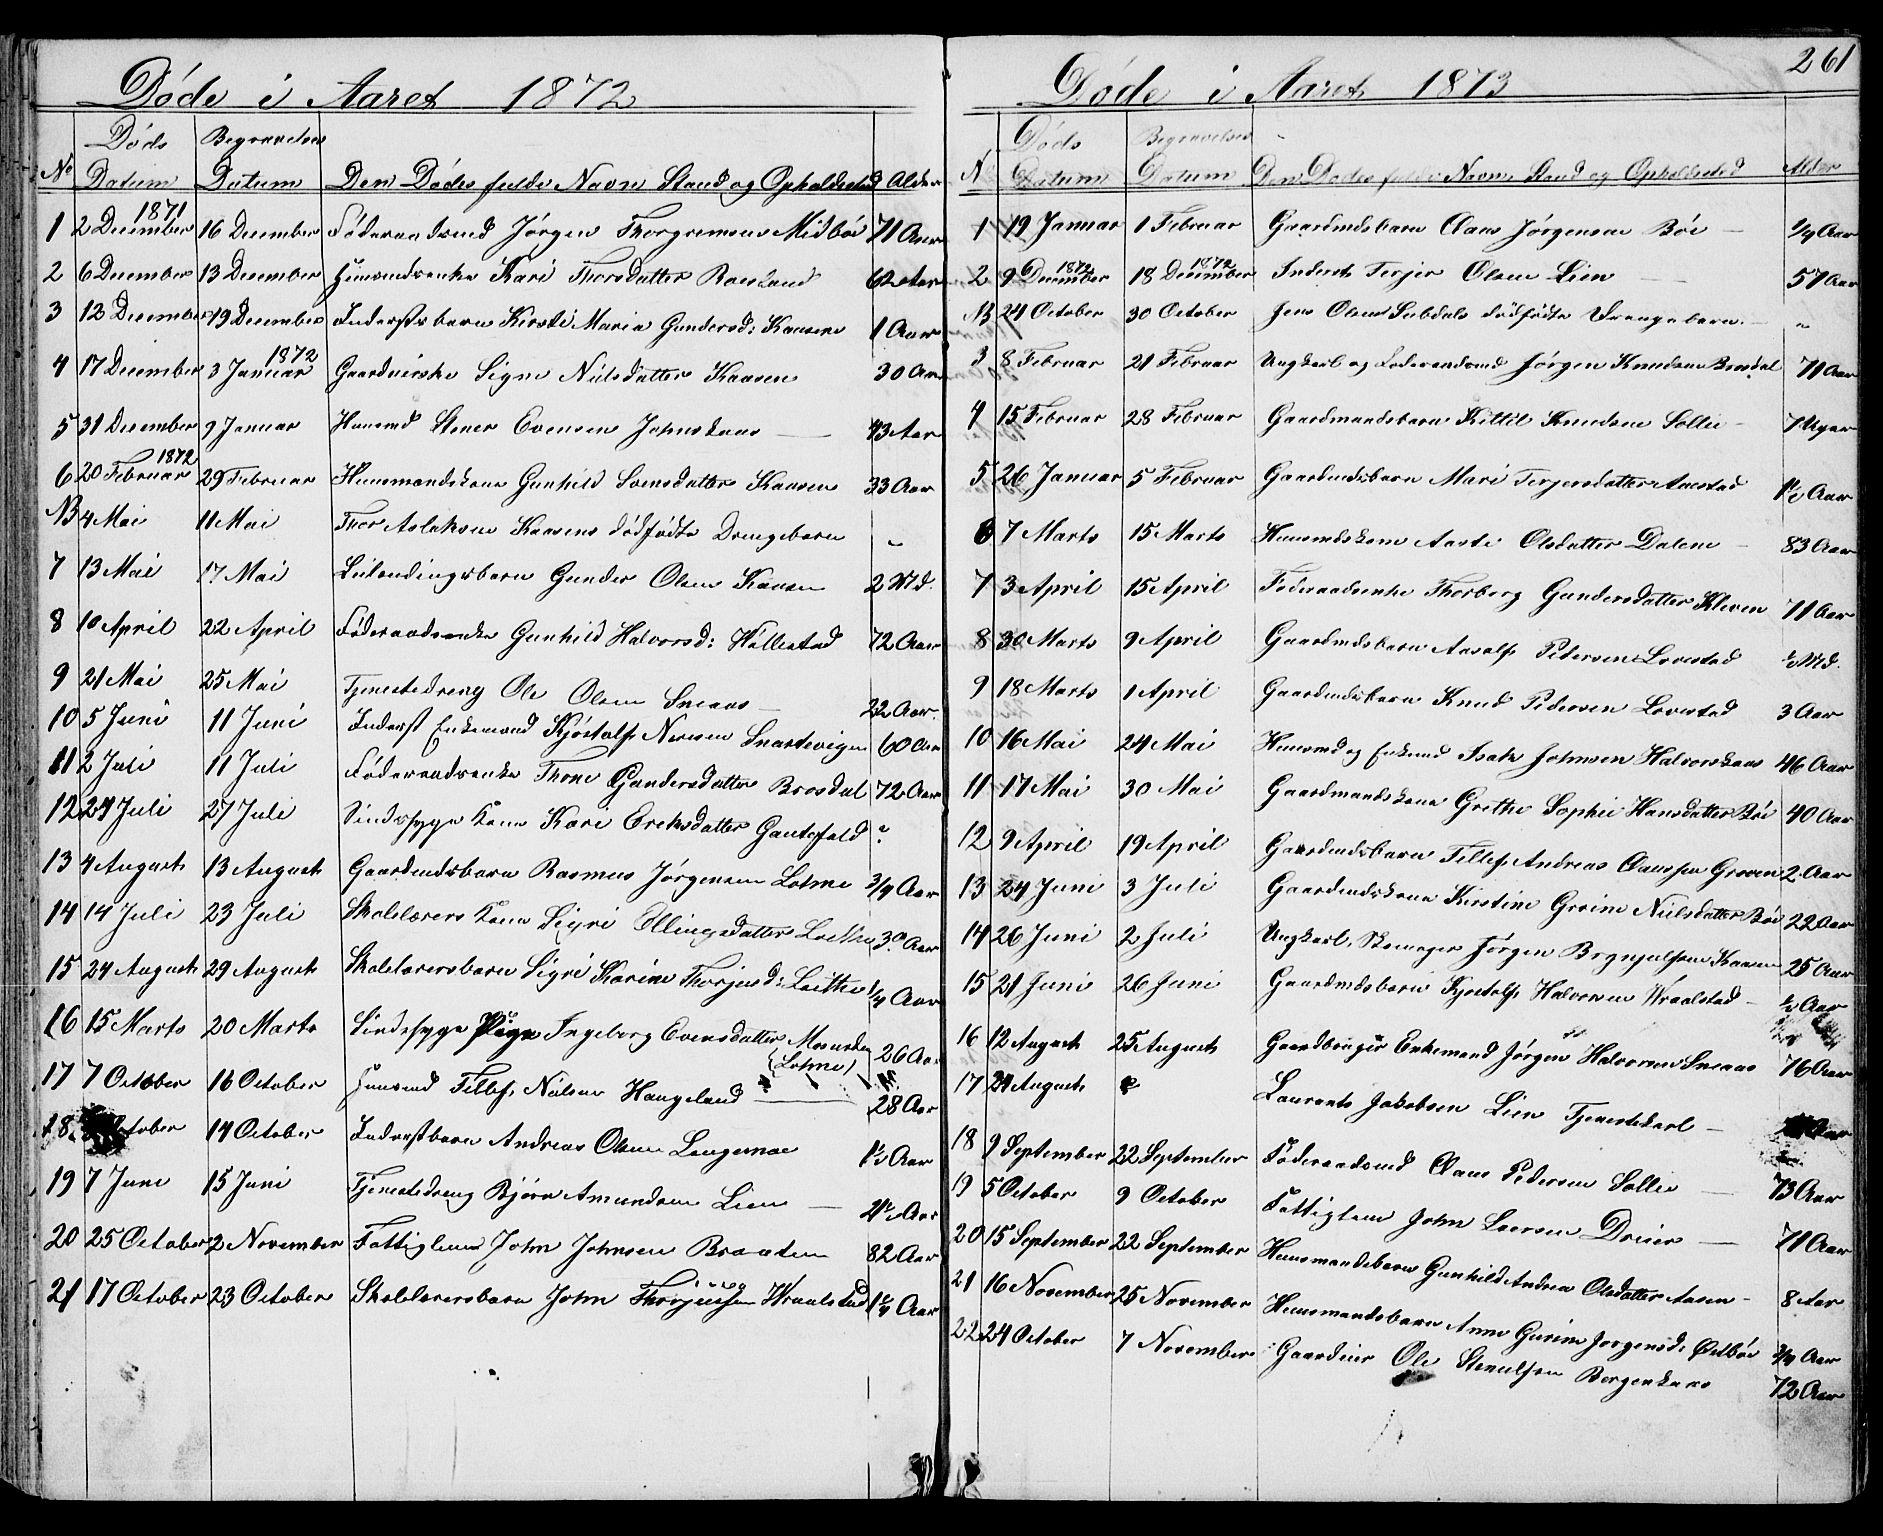 SAKO, Drangedal kirkebøker, G/Gb/L0001: Klokkerbok nr. II 1, 1856-1894, s. 261